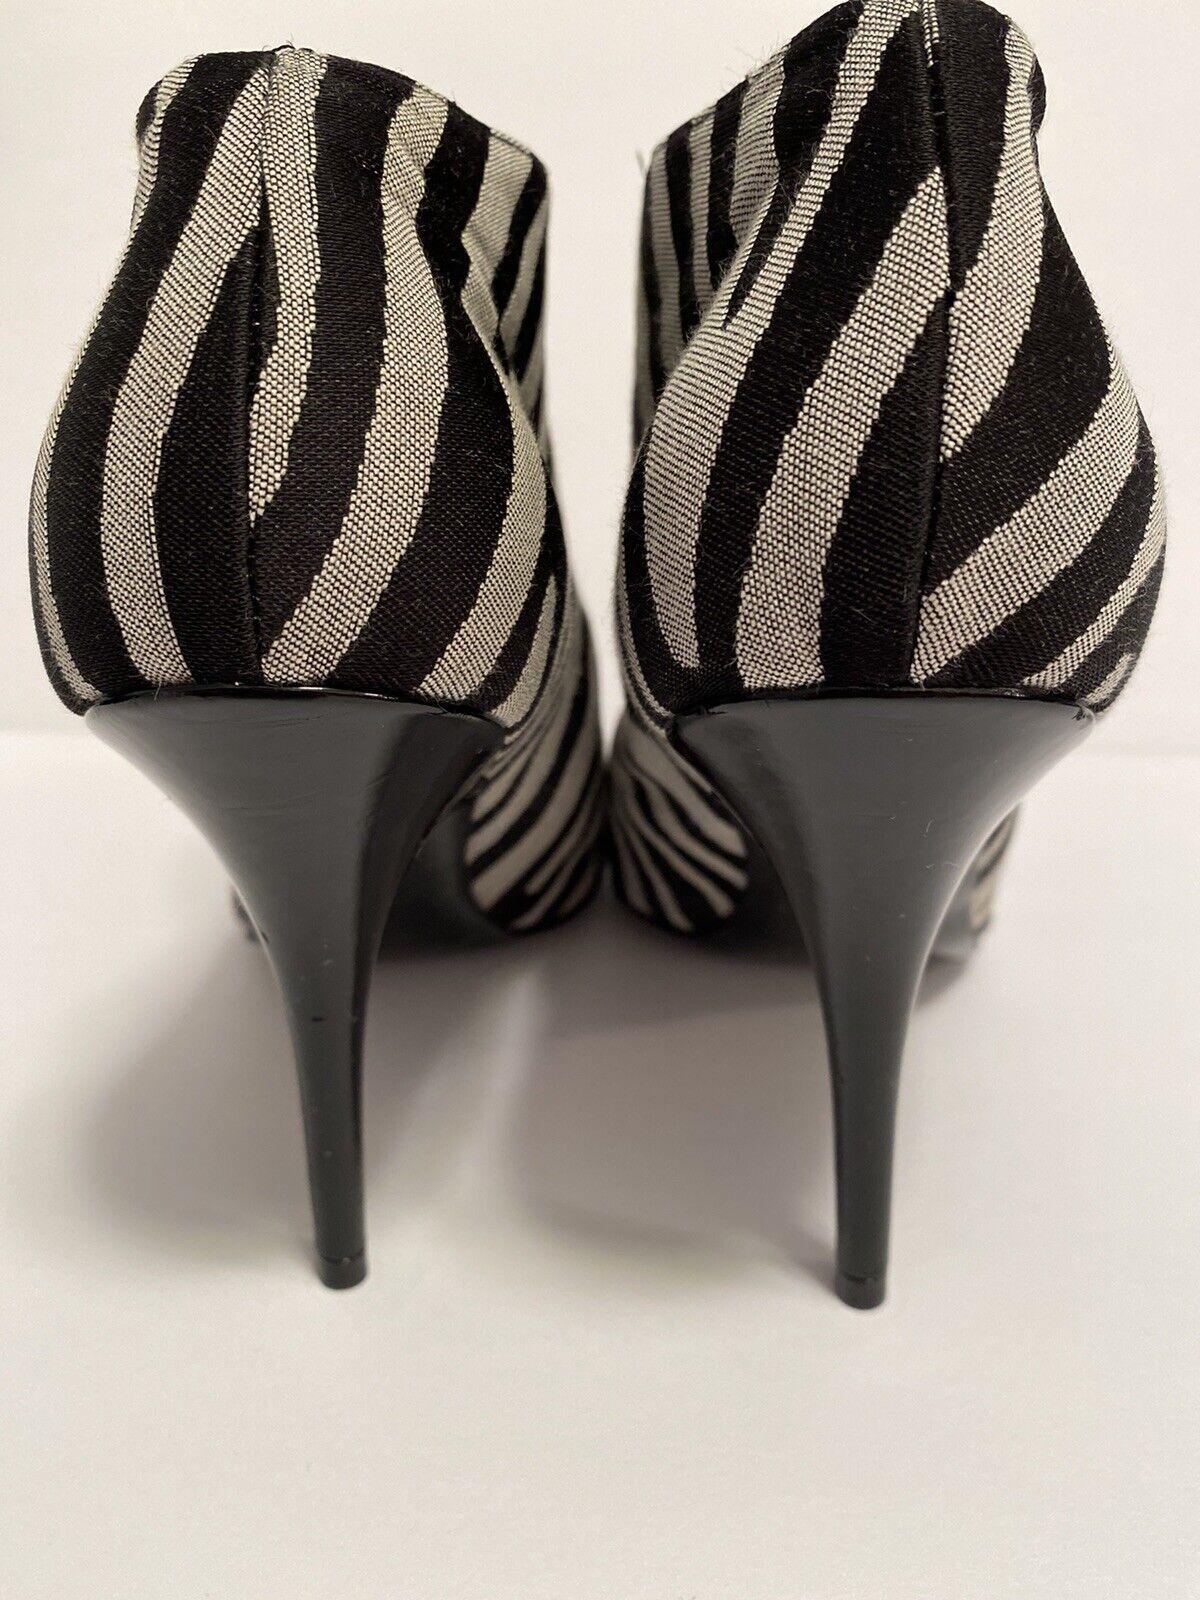 Stella McCartney Zebra Striped Boots Size 36 - image 6